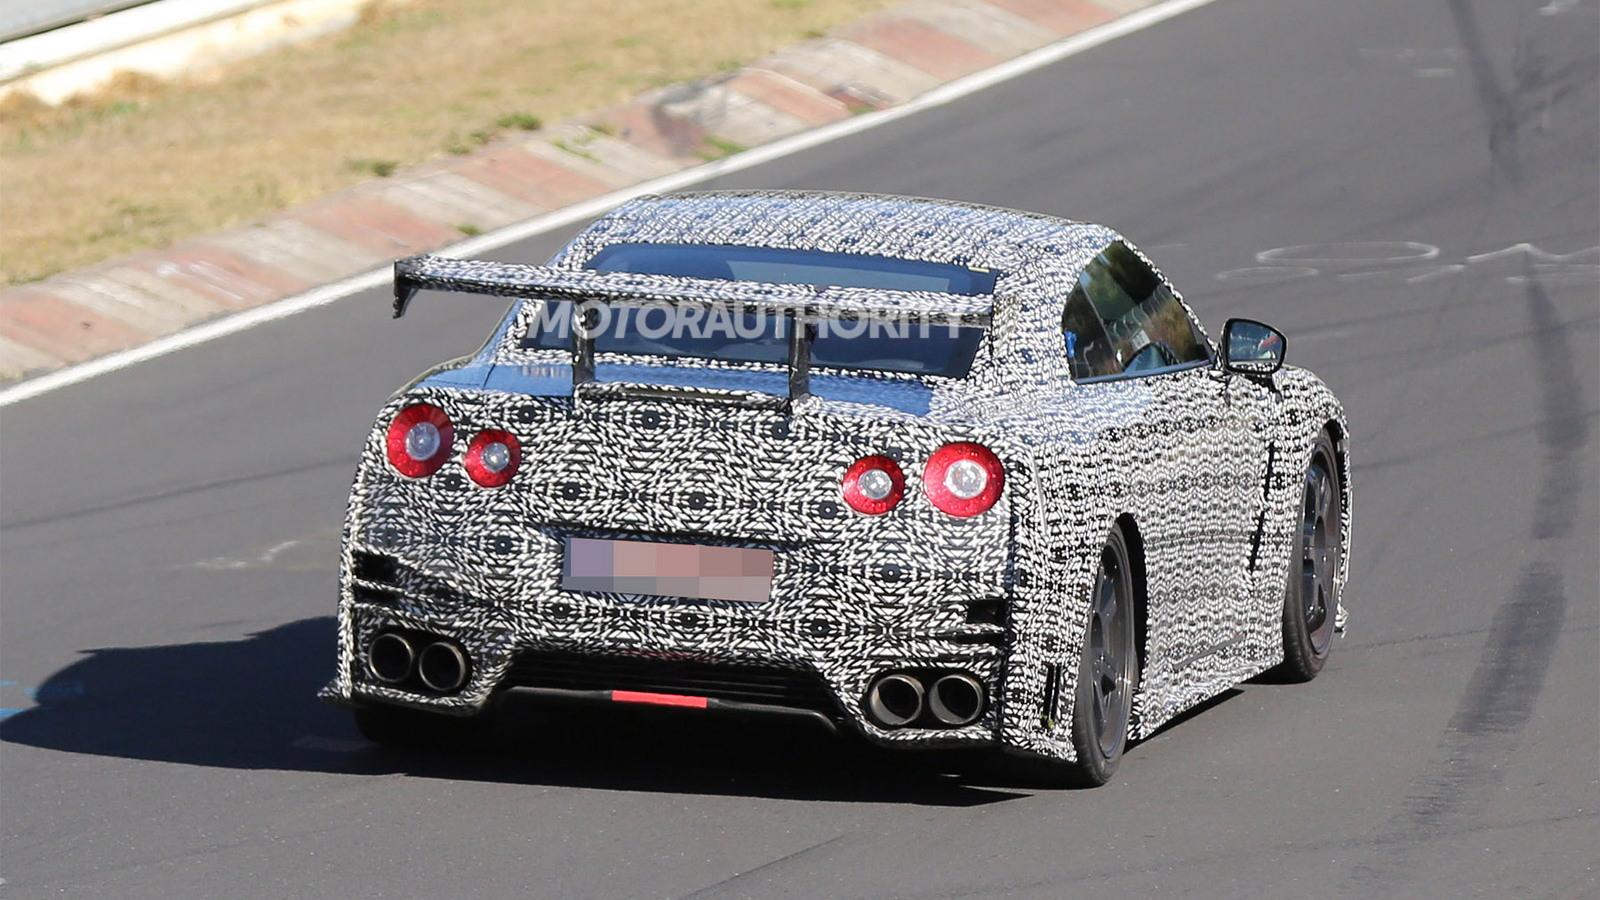 2015 Nissan GT-R NISMO spy shots